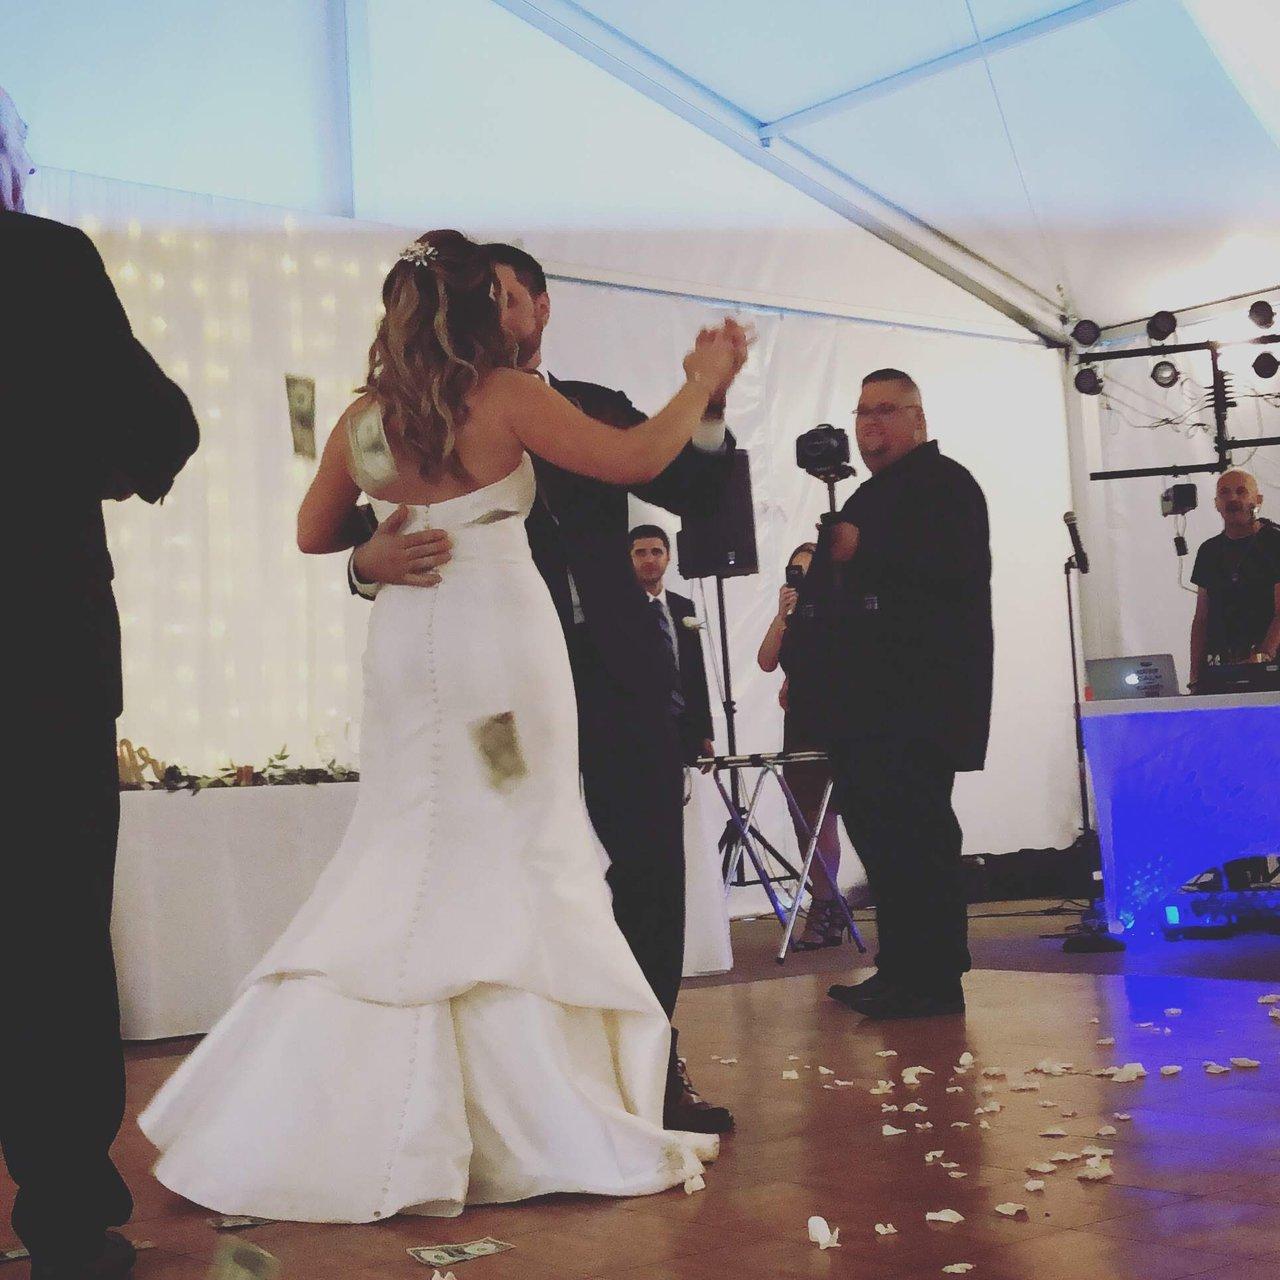 Leyjla and John Wedding—#LCJB2019 photo B8C5D28B-9EEE-4C0D-A4E4-D7EAEB5012A7.jpg